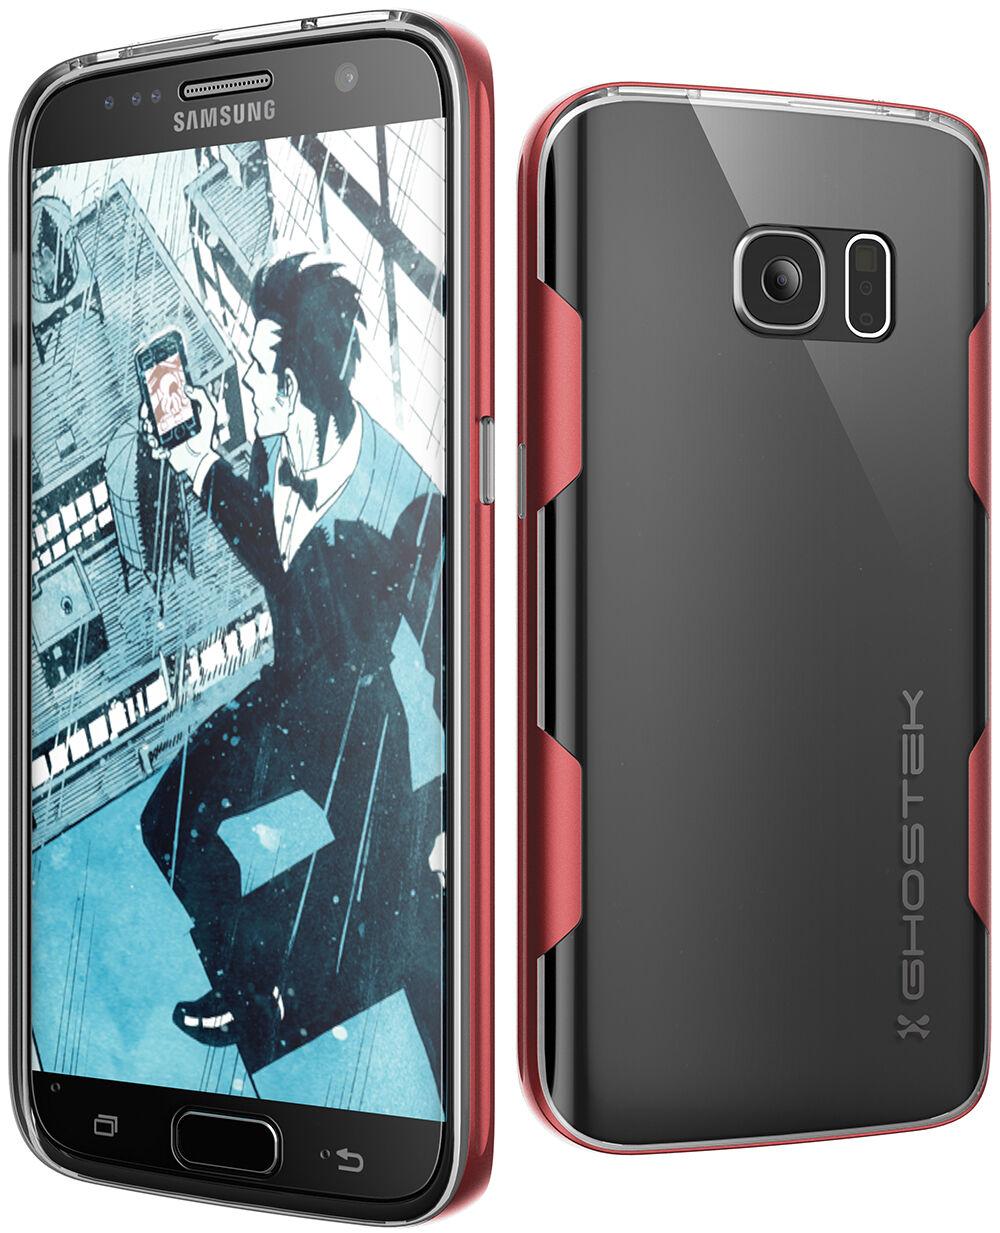 iPhone 5 5s SE 6 6s Galaxy S6 S7 Edge Note 5 LG V10 Case | G